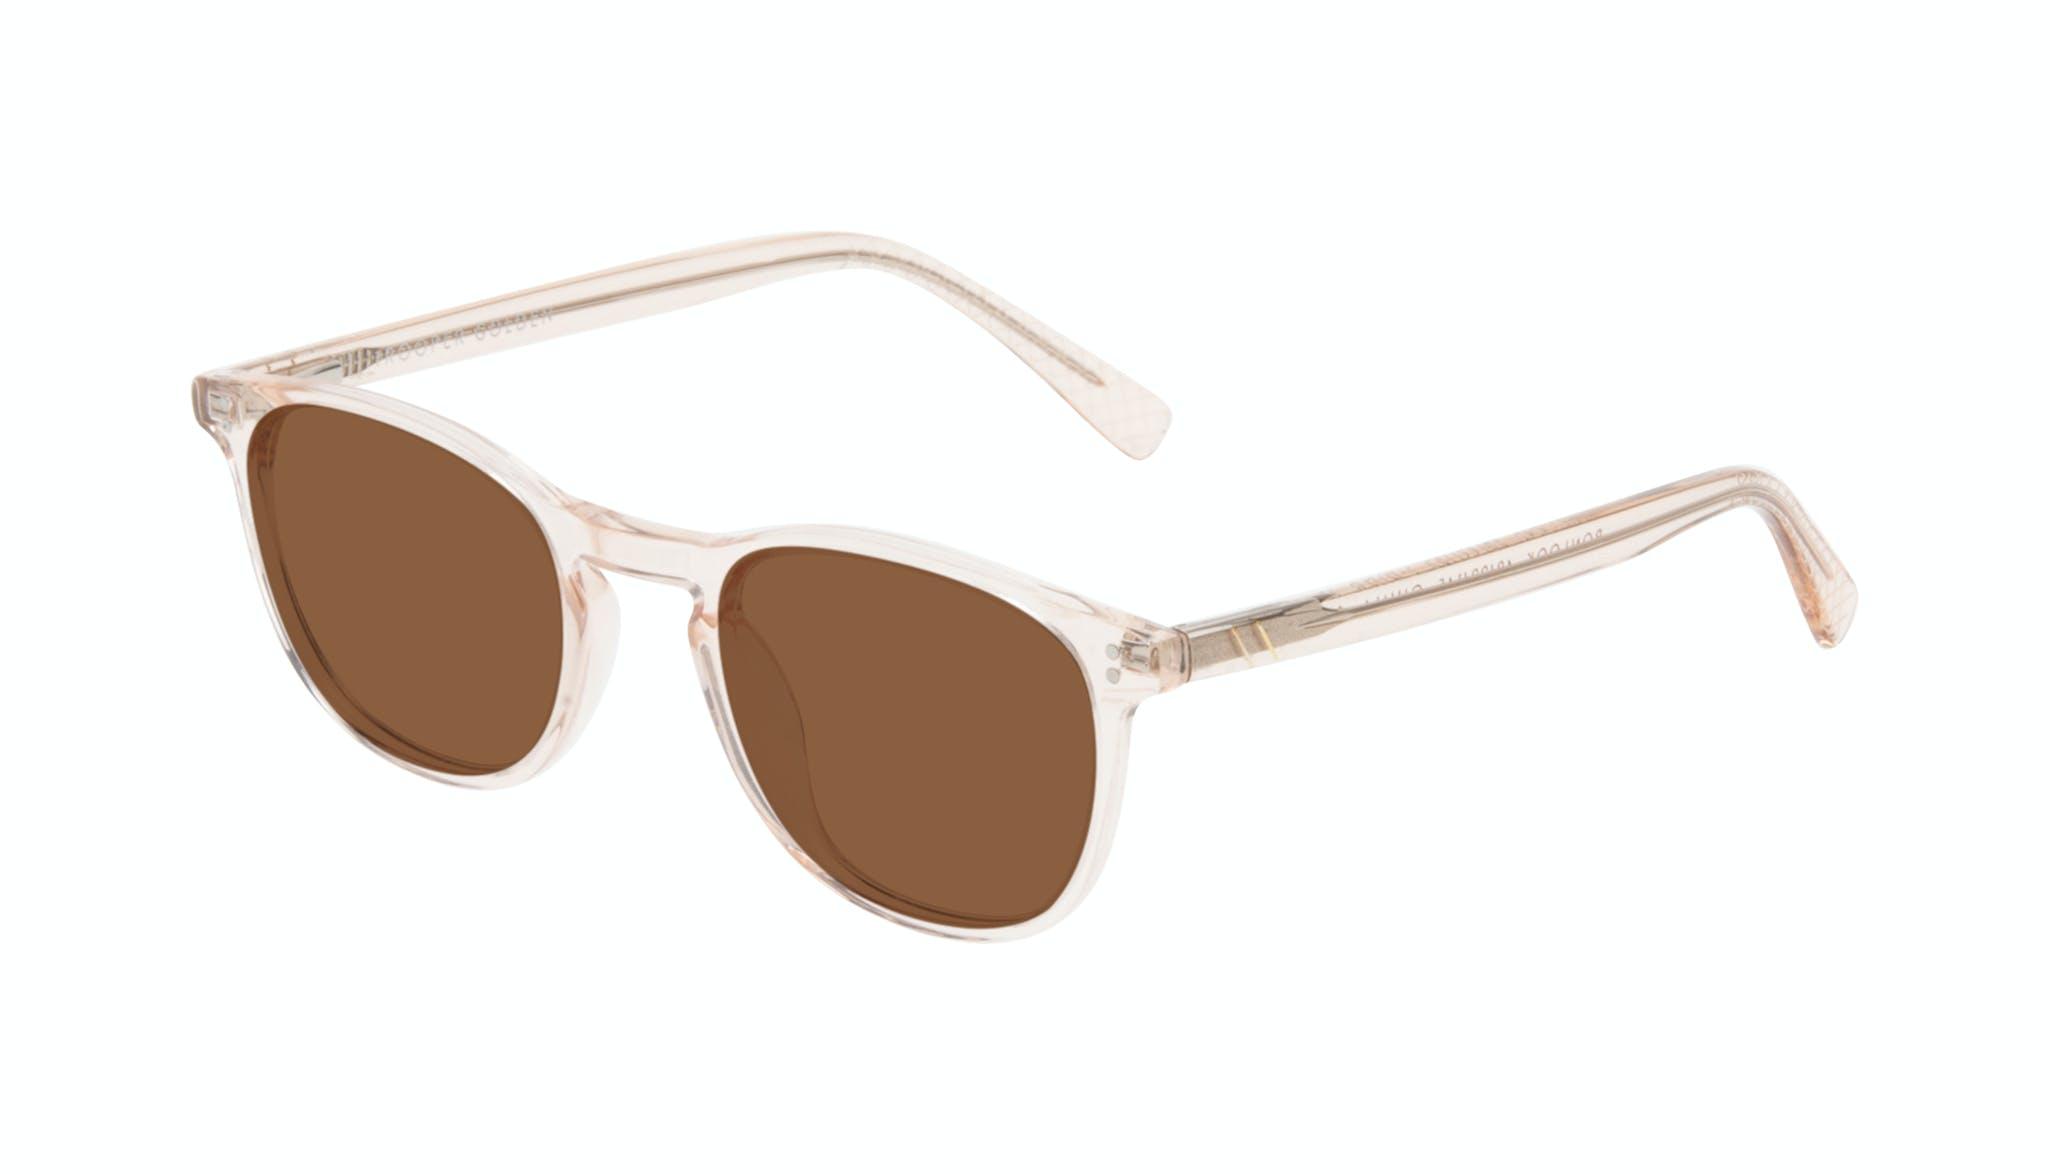 Affordable Fashion Glasses Round Sunglasses Men Trooper Golden Tilt